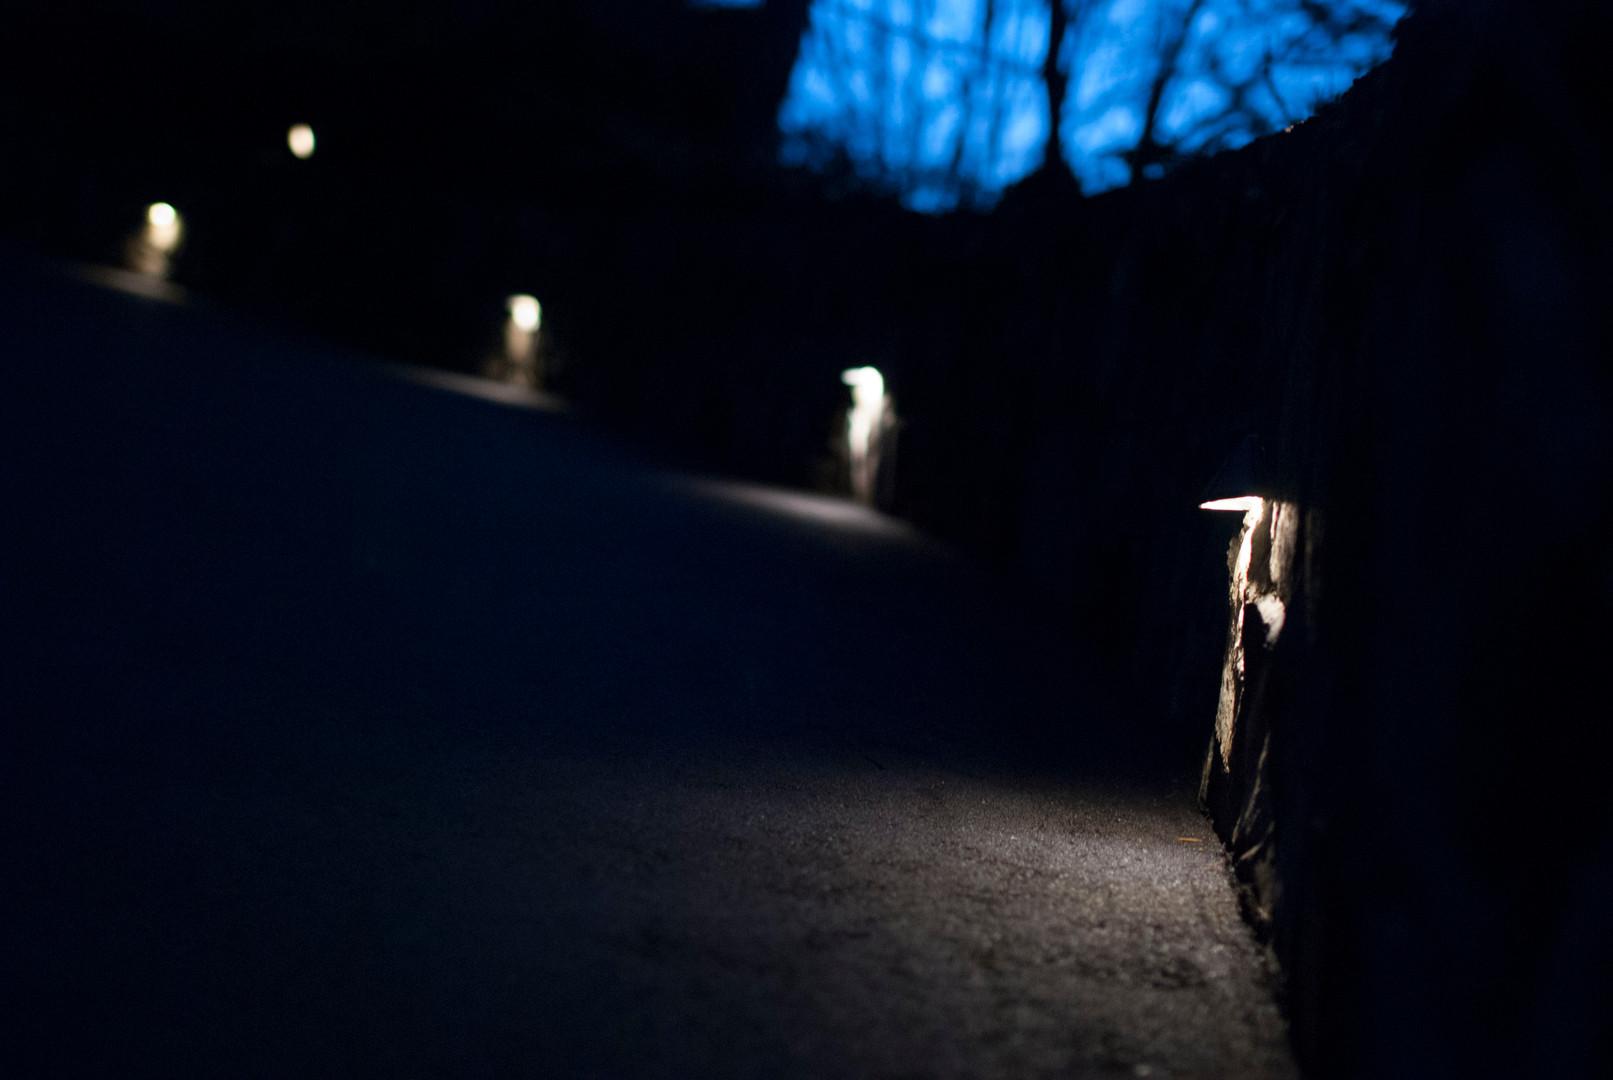 Landscape lights on rock wall cascading light on driveway